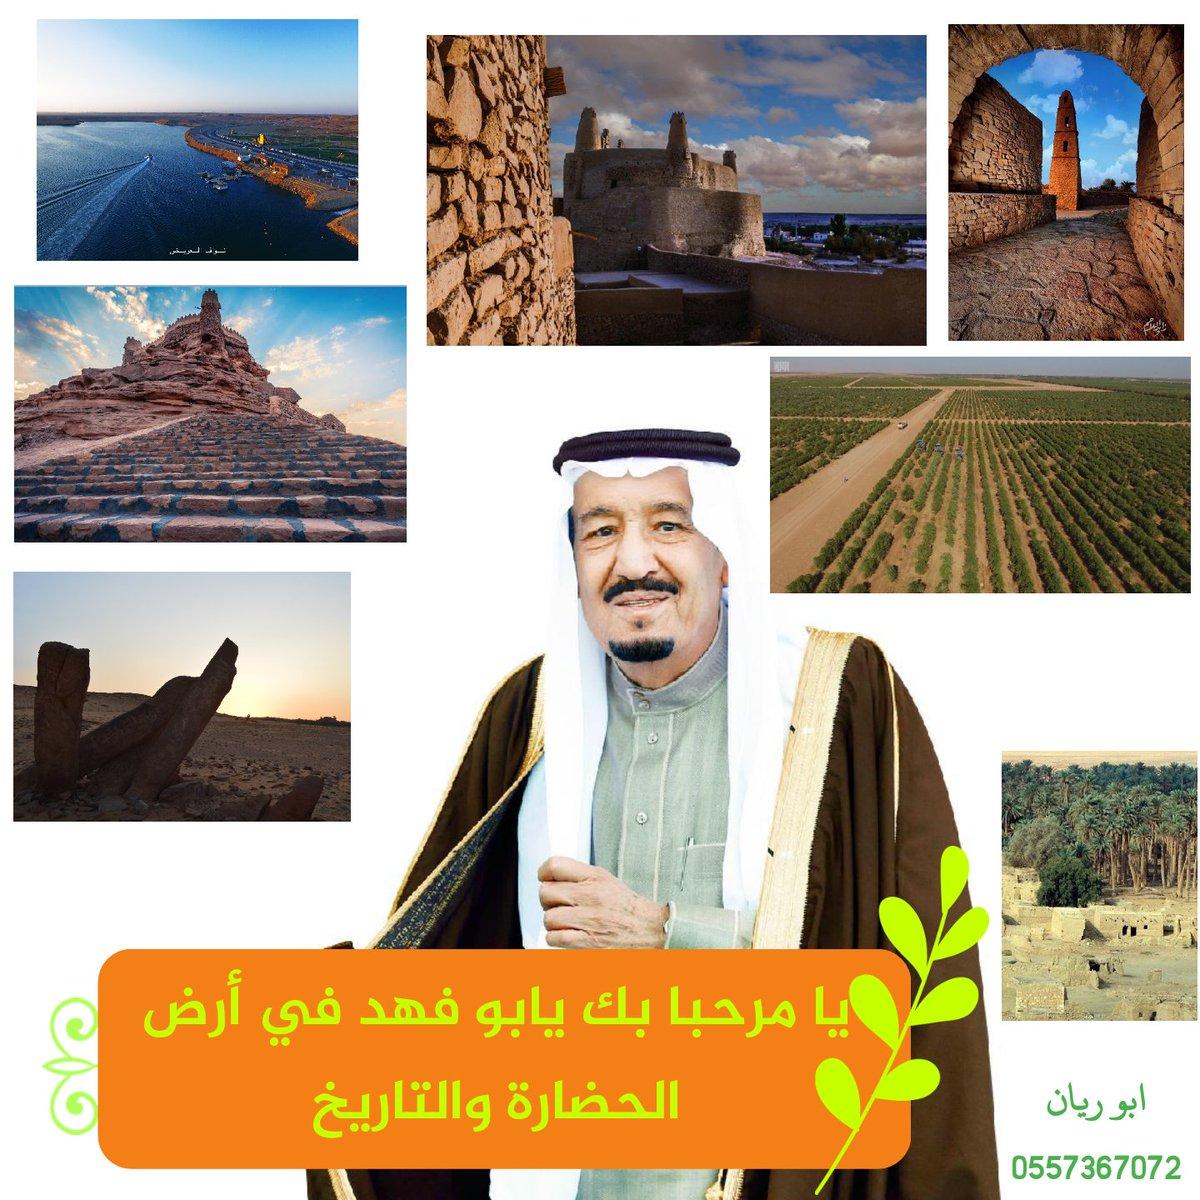 RT @MohammedTarfay: #الملك_سلمان_في_الجوف #سكاكا_الجوف مرحبا ألف https://t.co/uscq6jCwcd